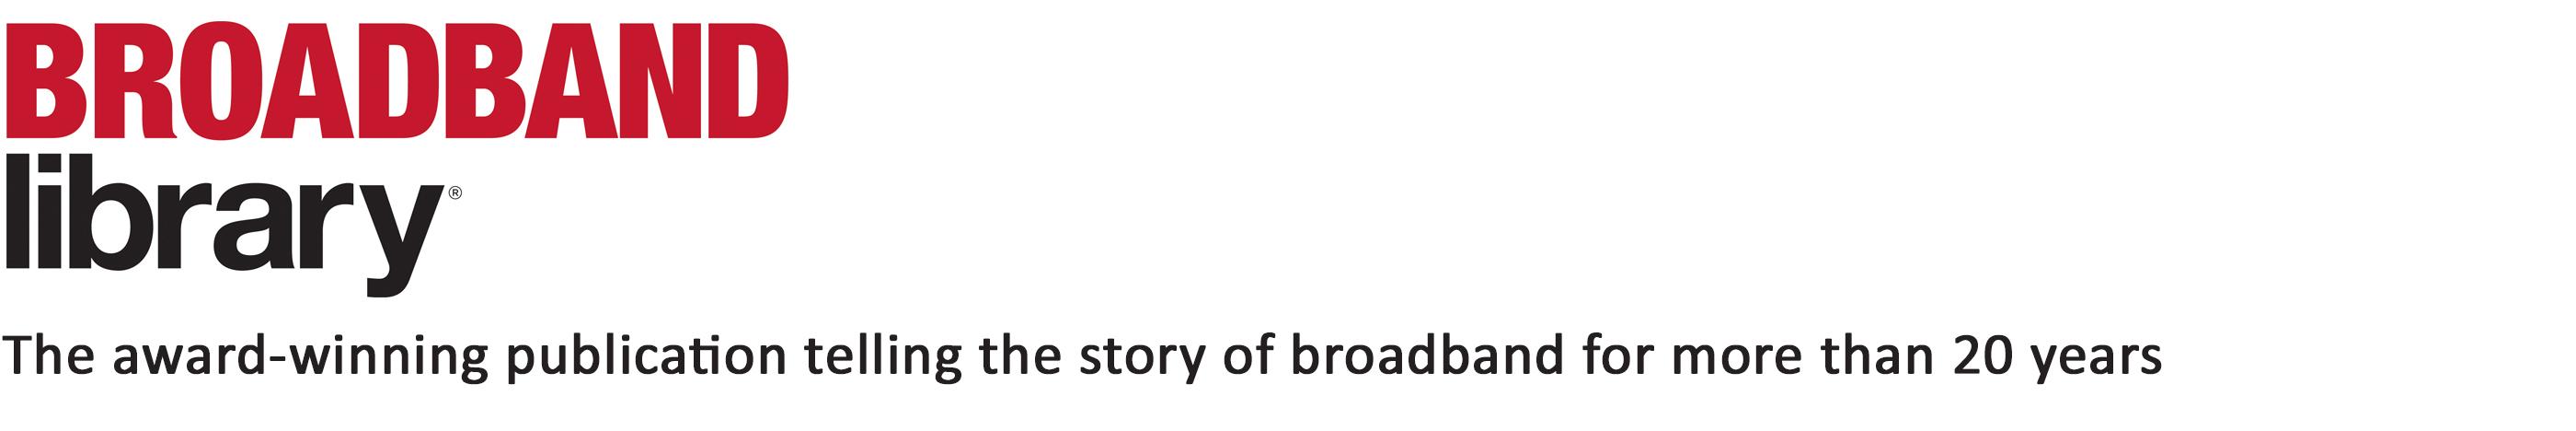 Broadband Library